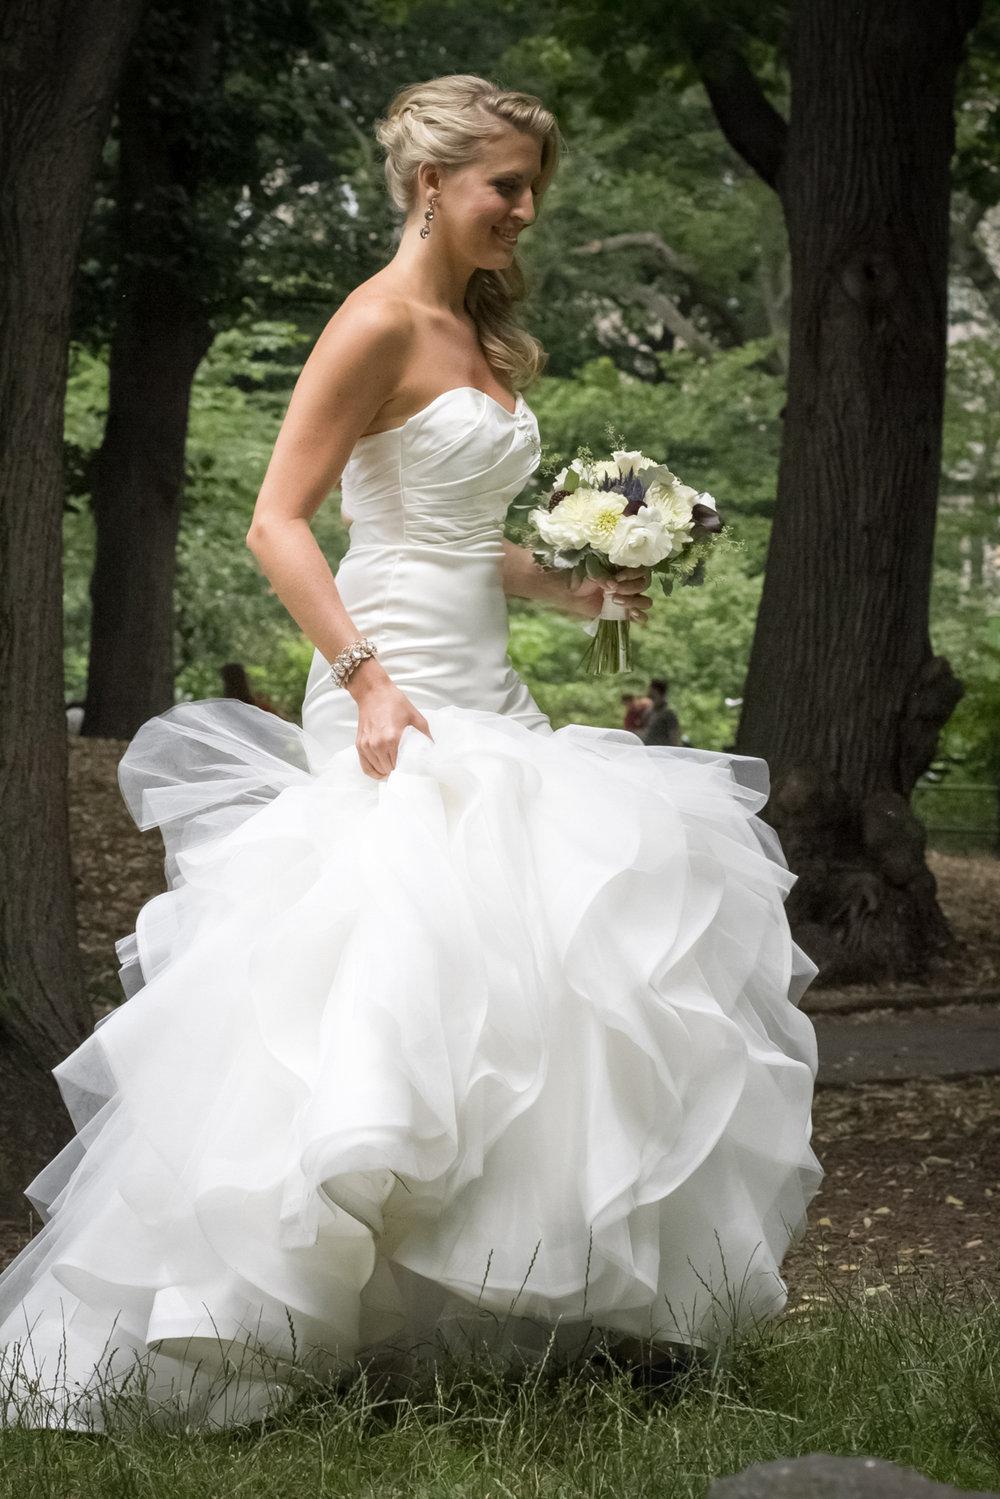 New-york-city-weddings-53.jpg